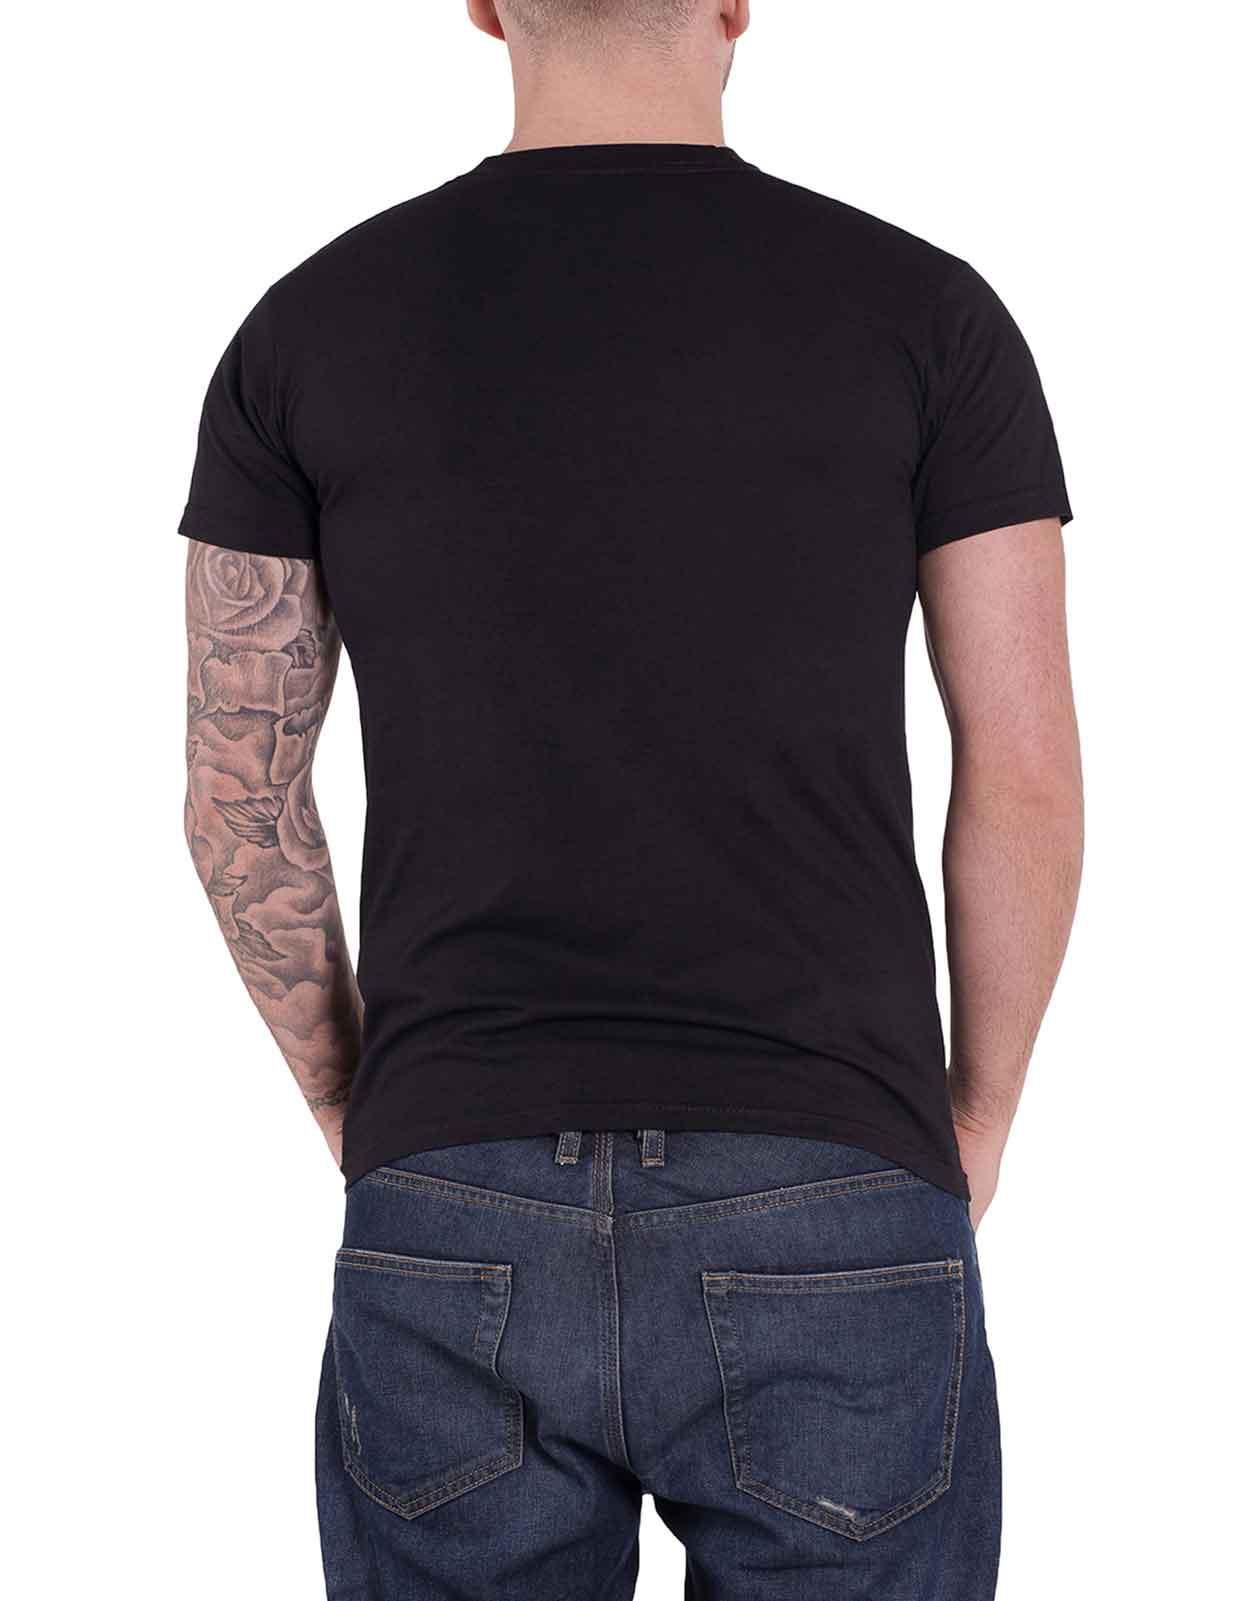 Official-Motley-Crue-T-Shirt-Shout-at-the-Devil-The-Dirt-Tour-Band-Logo-Mens thumbnail 35